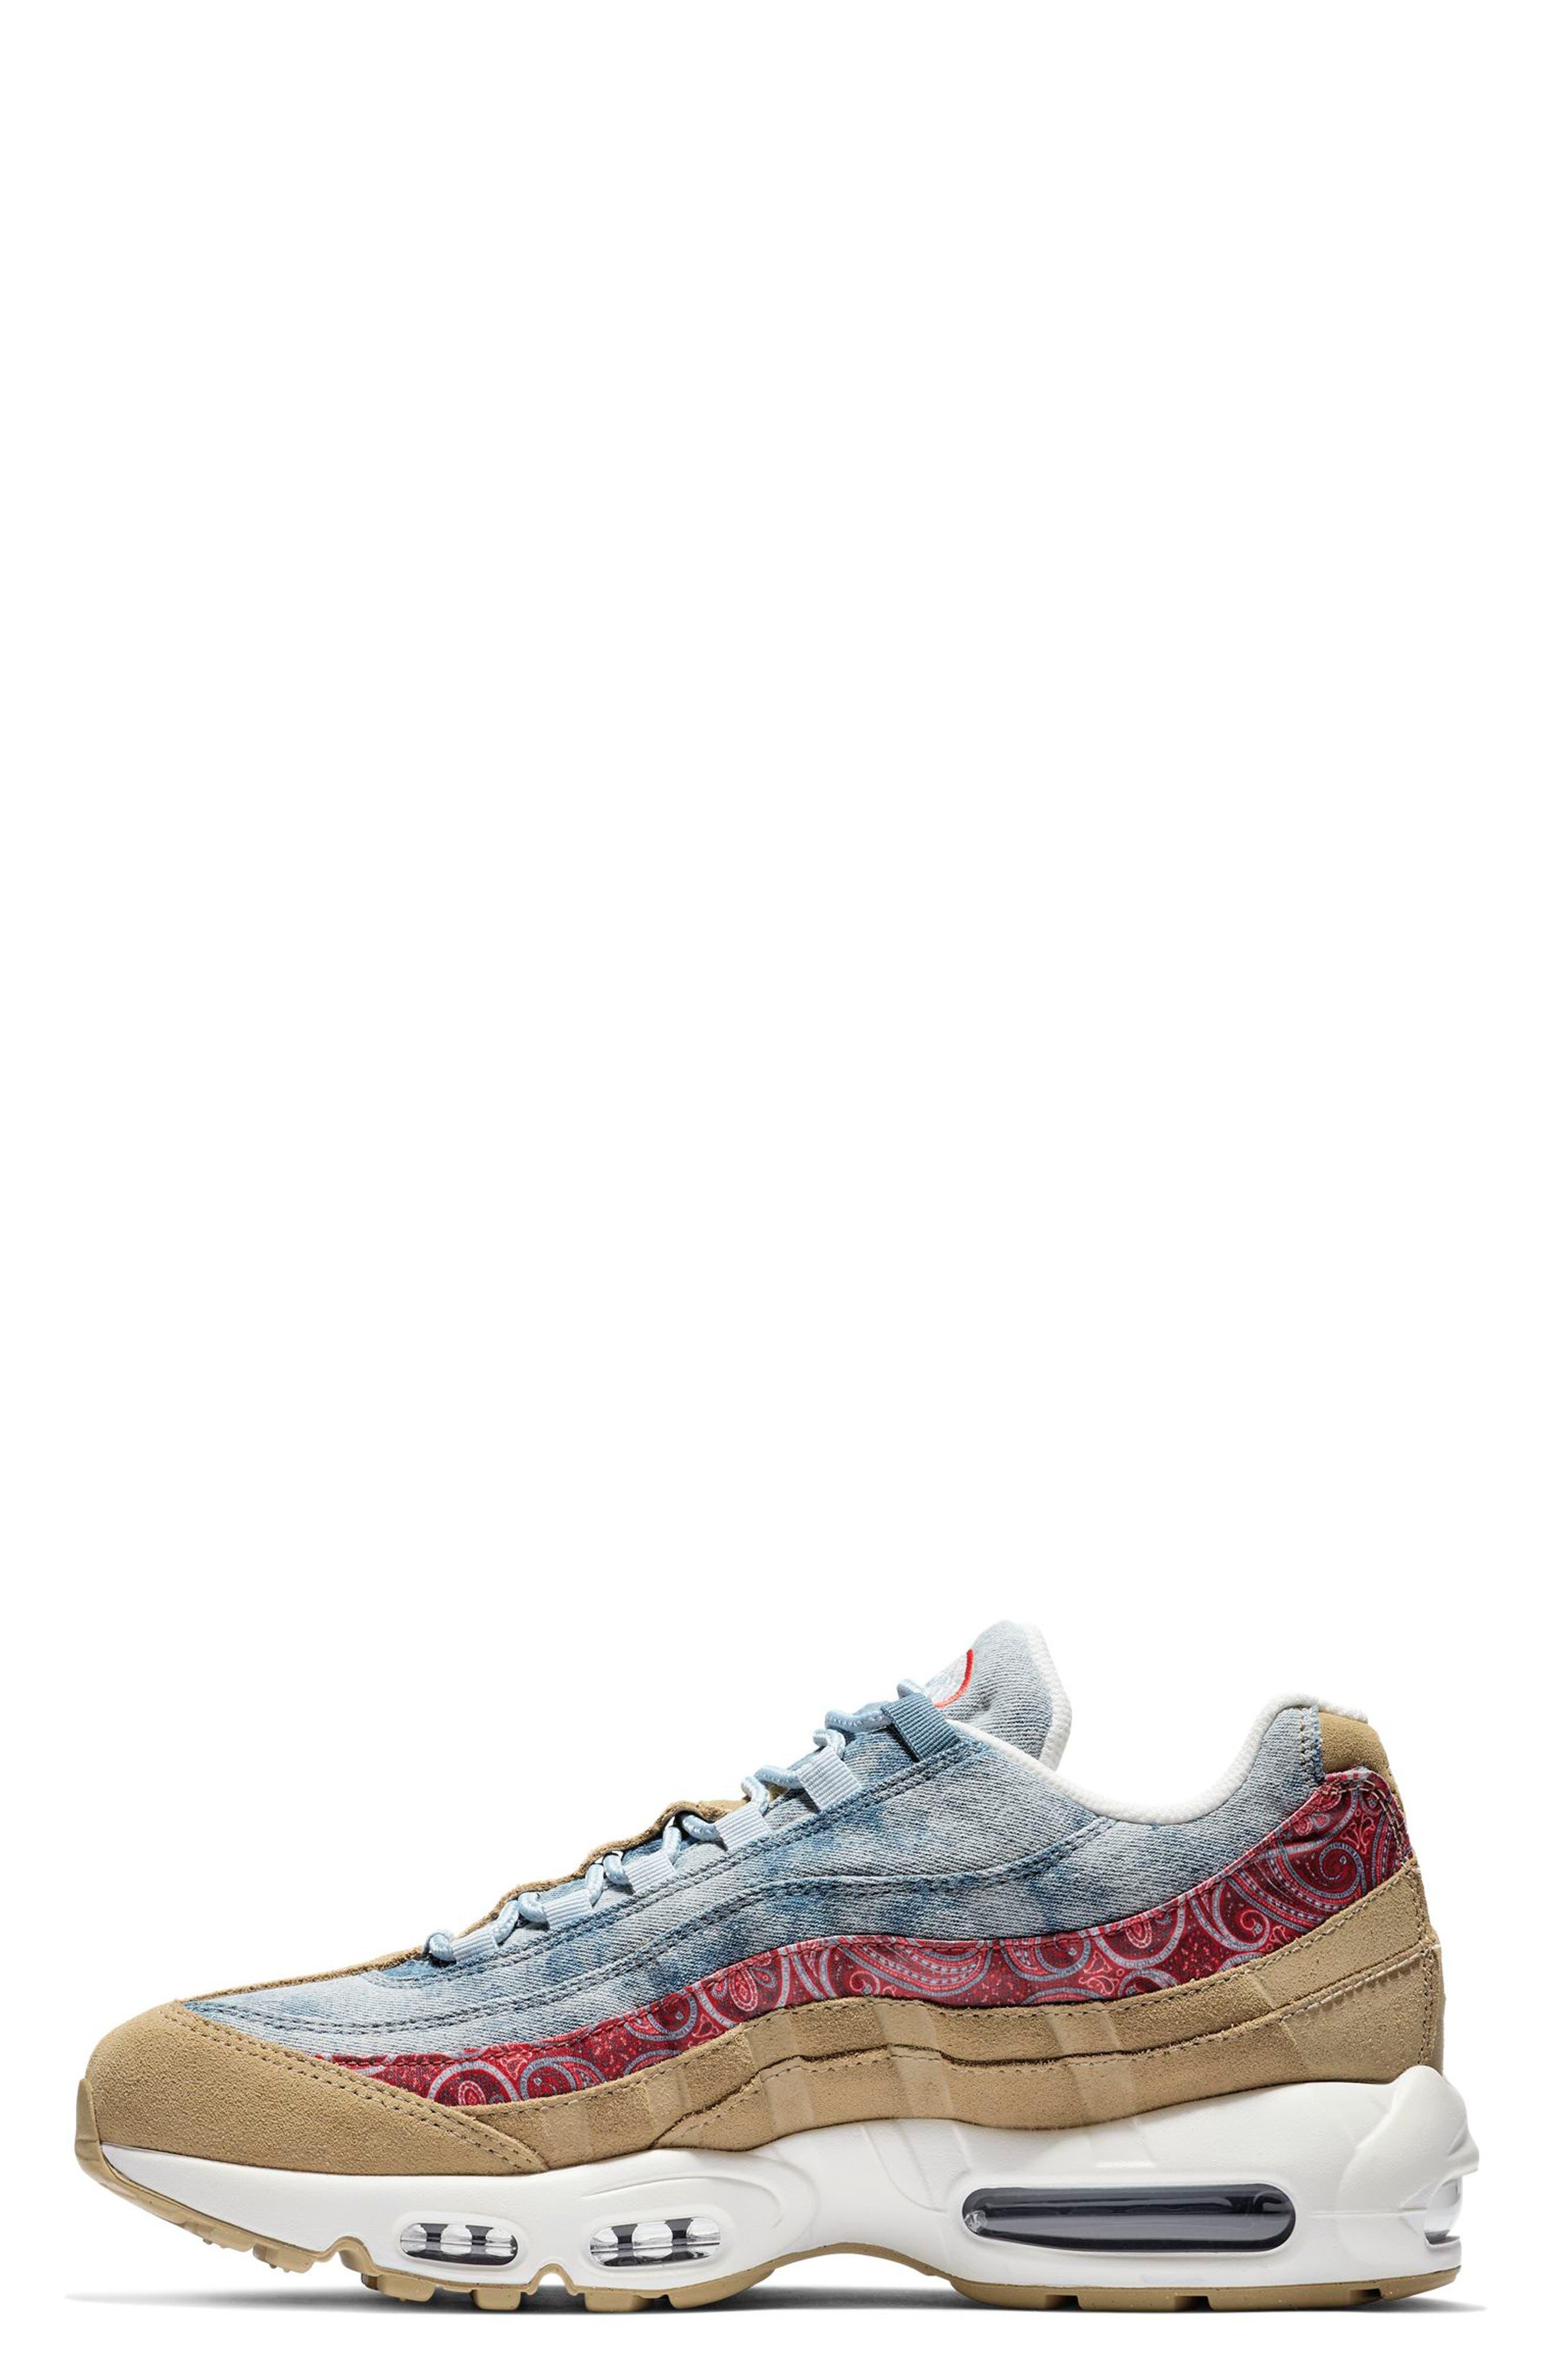 Air Max 95 Sneaker,                             Alternate thumbnail 3, color,                             PARACHUTE BEIGE/ RED